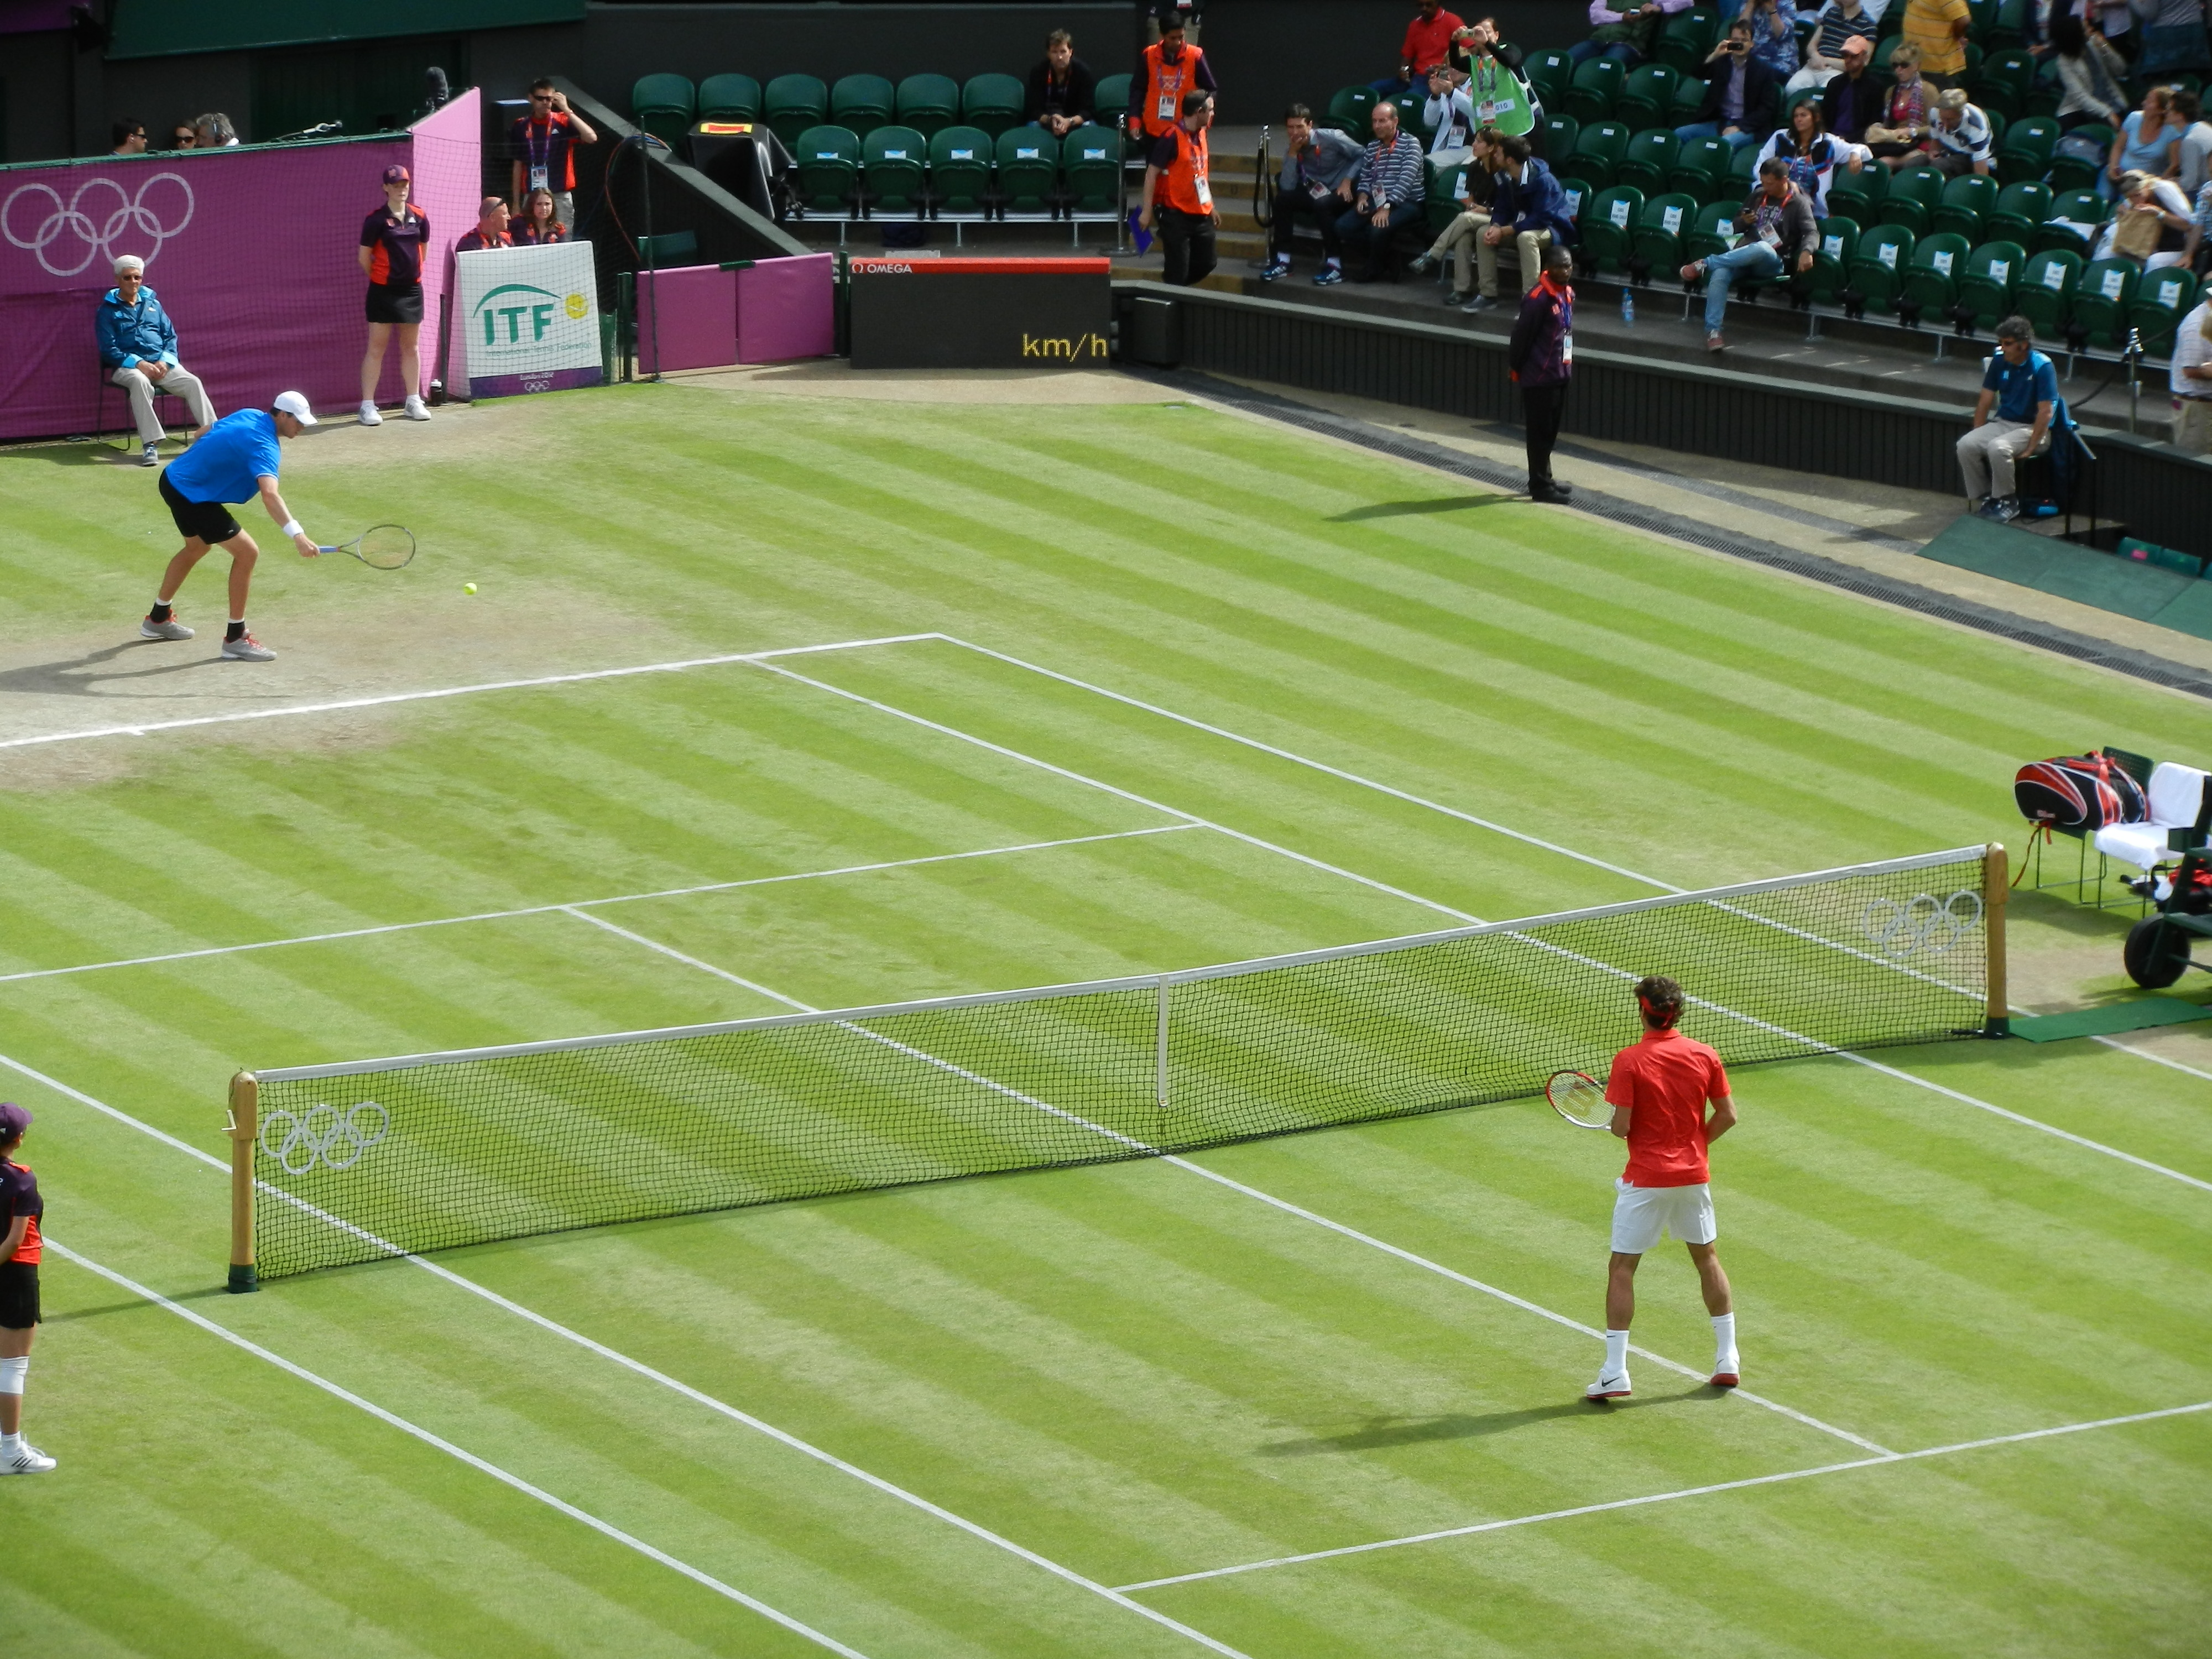 Tennis at the 2012 Summer Olympics – Men's singles - Wikipedia